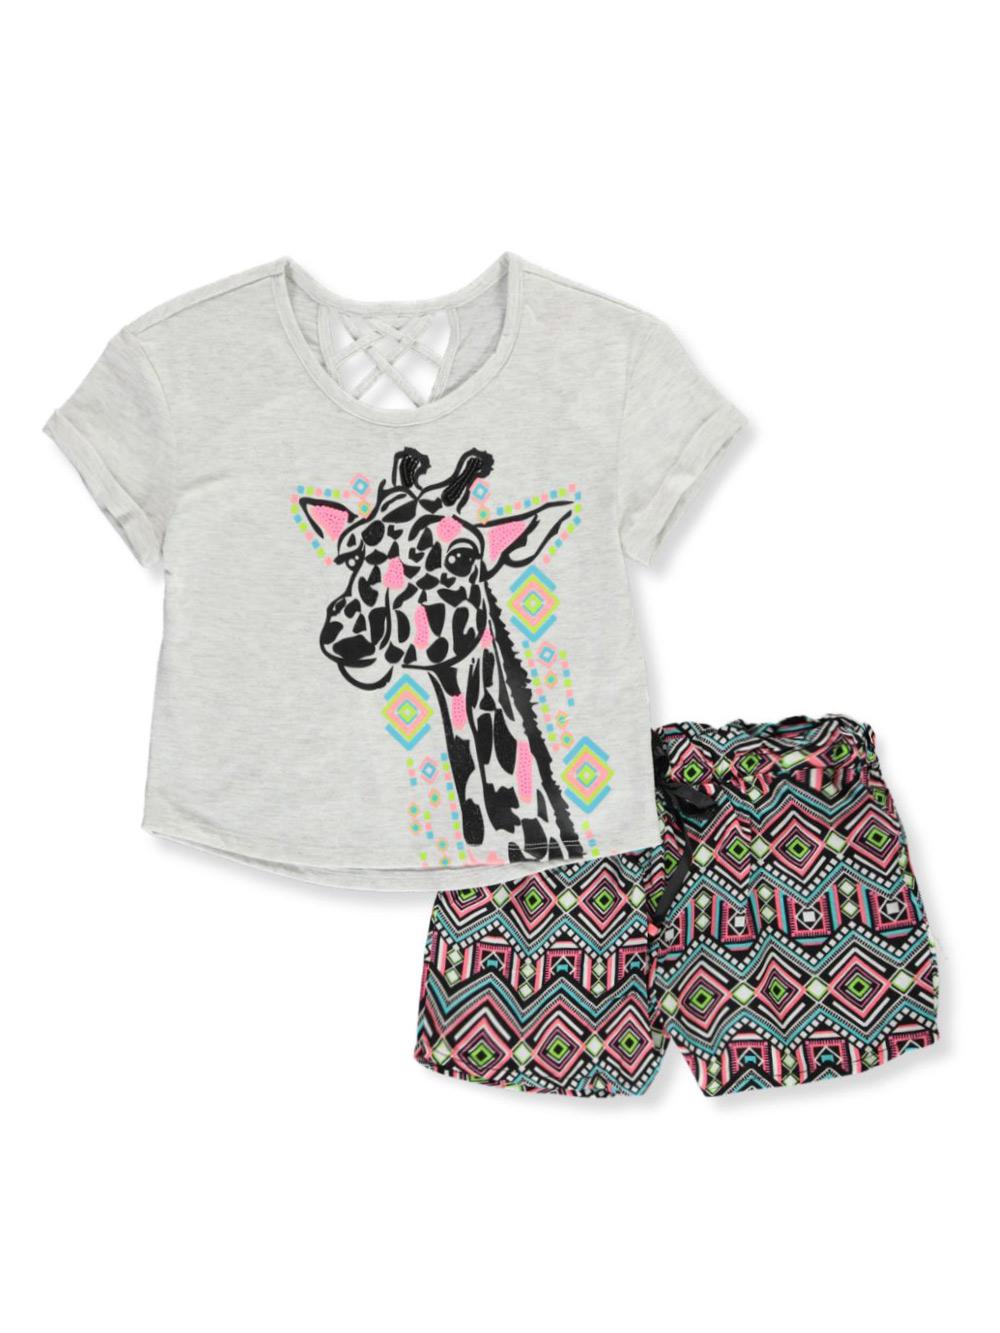 RMLA Girls 2-Piece Short Set Outfit